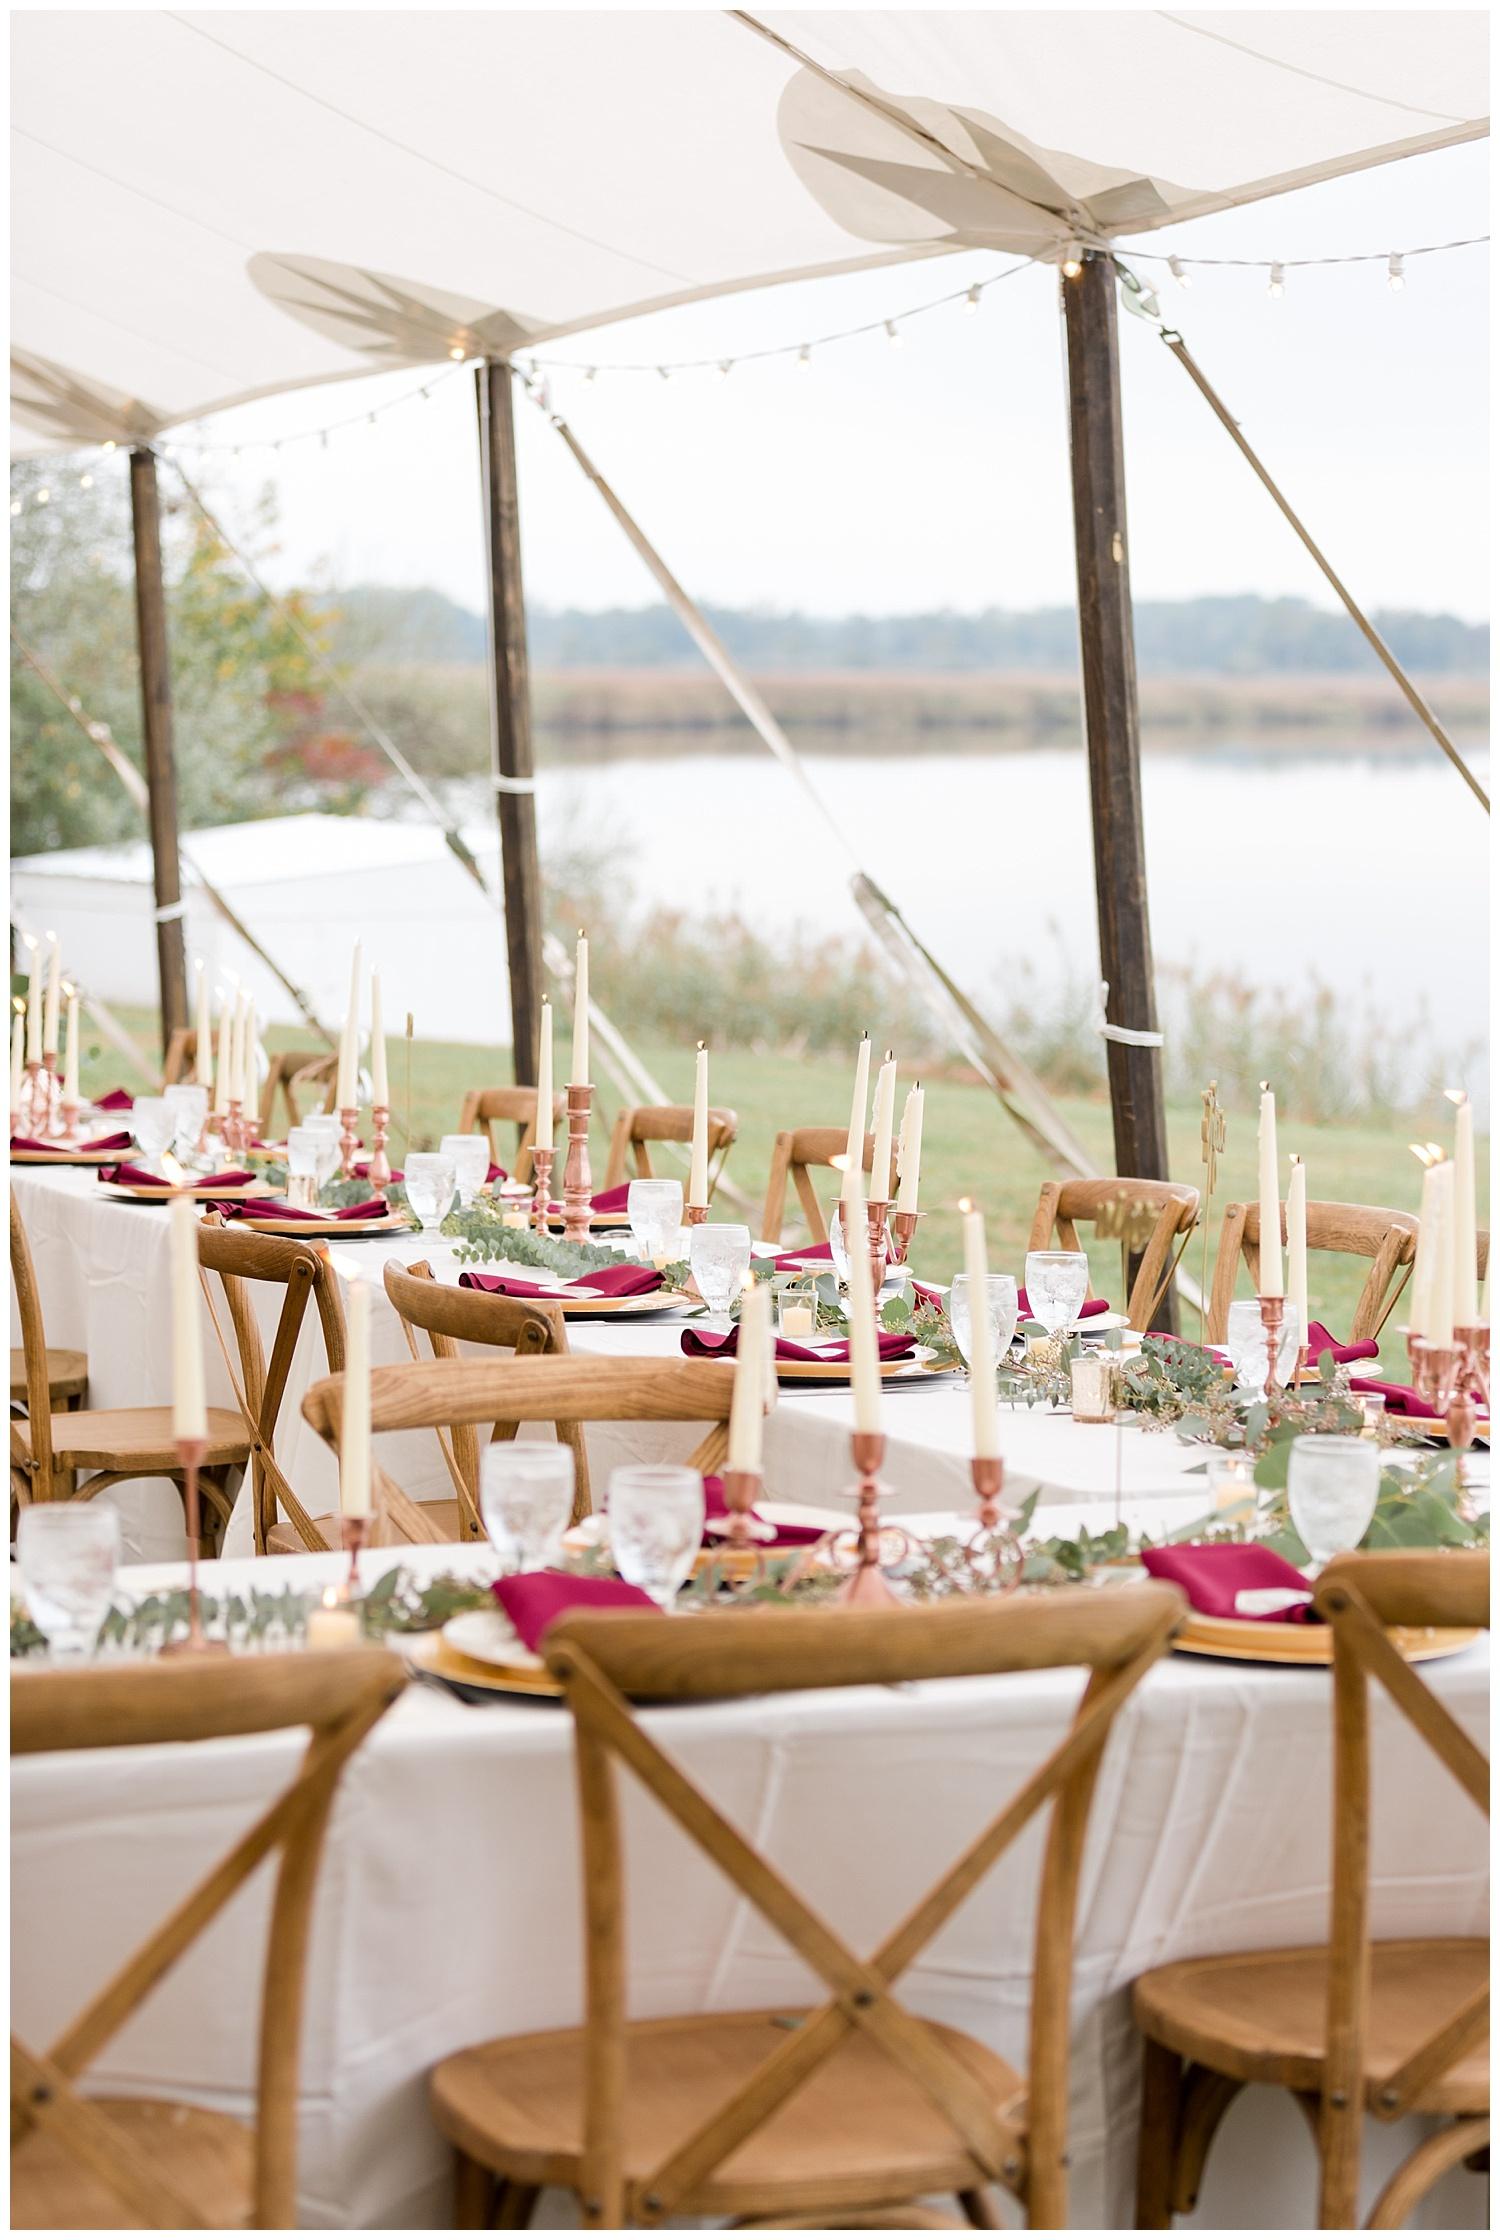 Eagle Manor | Waterfront Jersey Shore Barn Wedding | Fairfield Township, NJ | www.redoakweddings.com